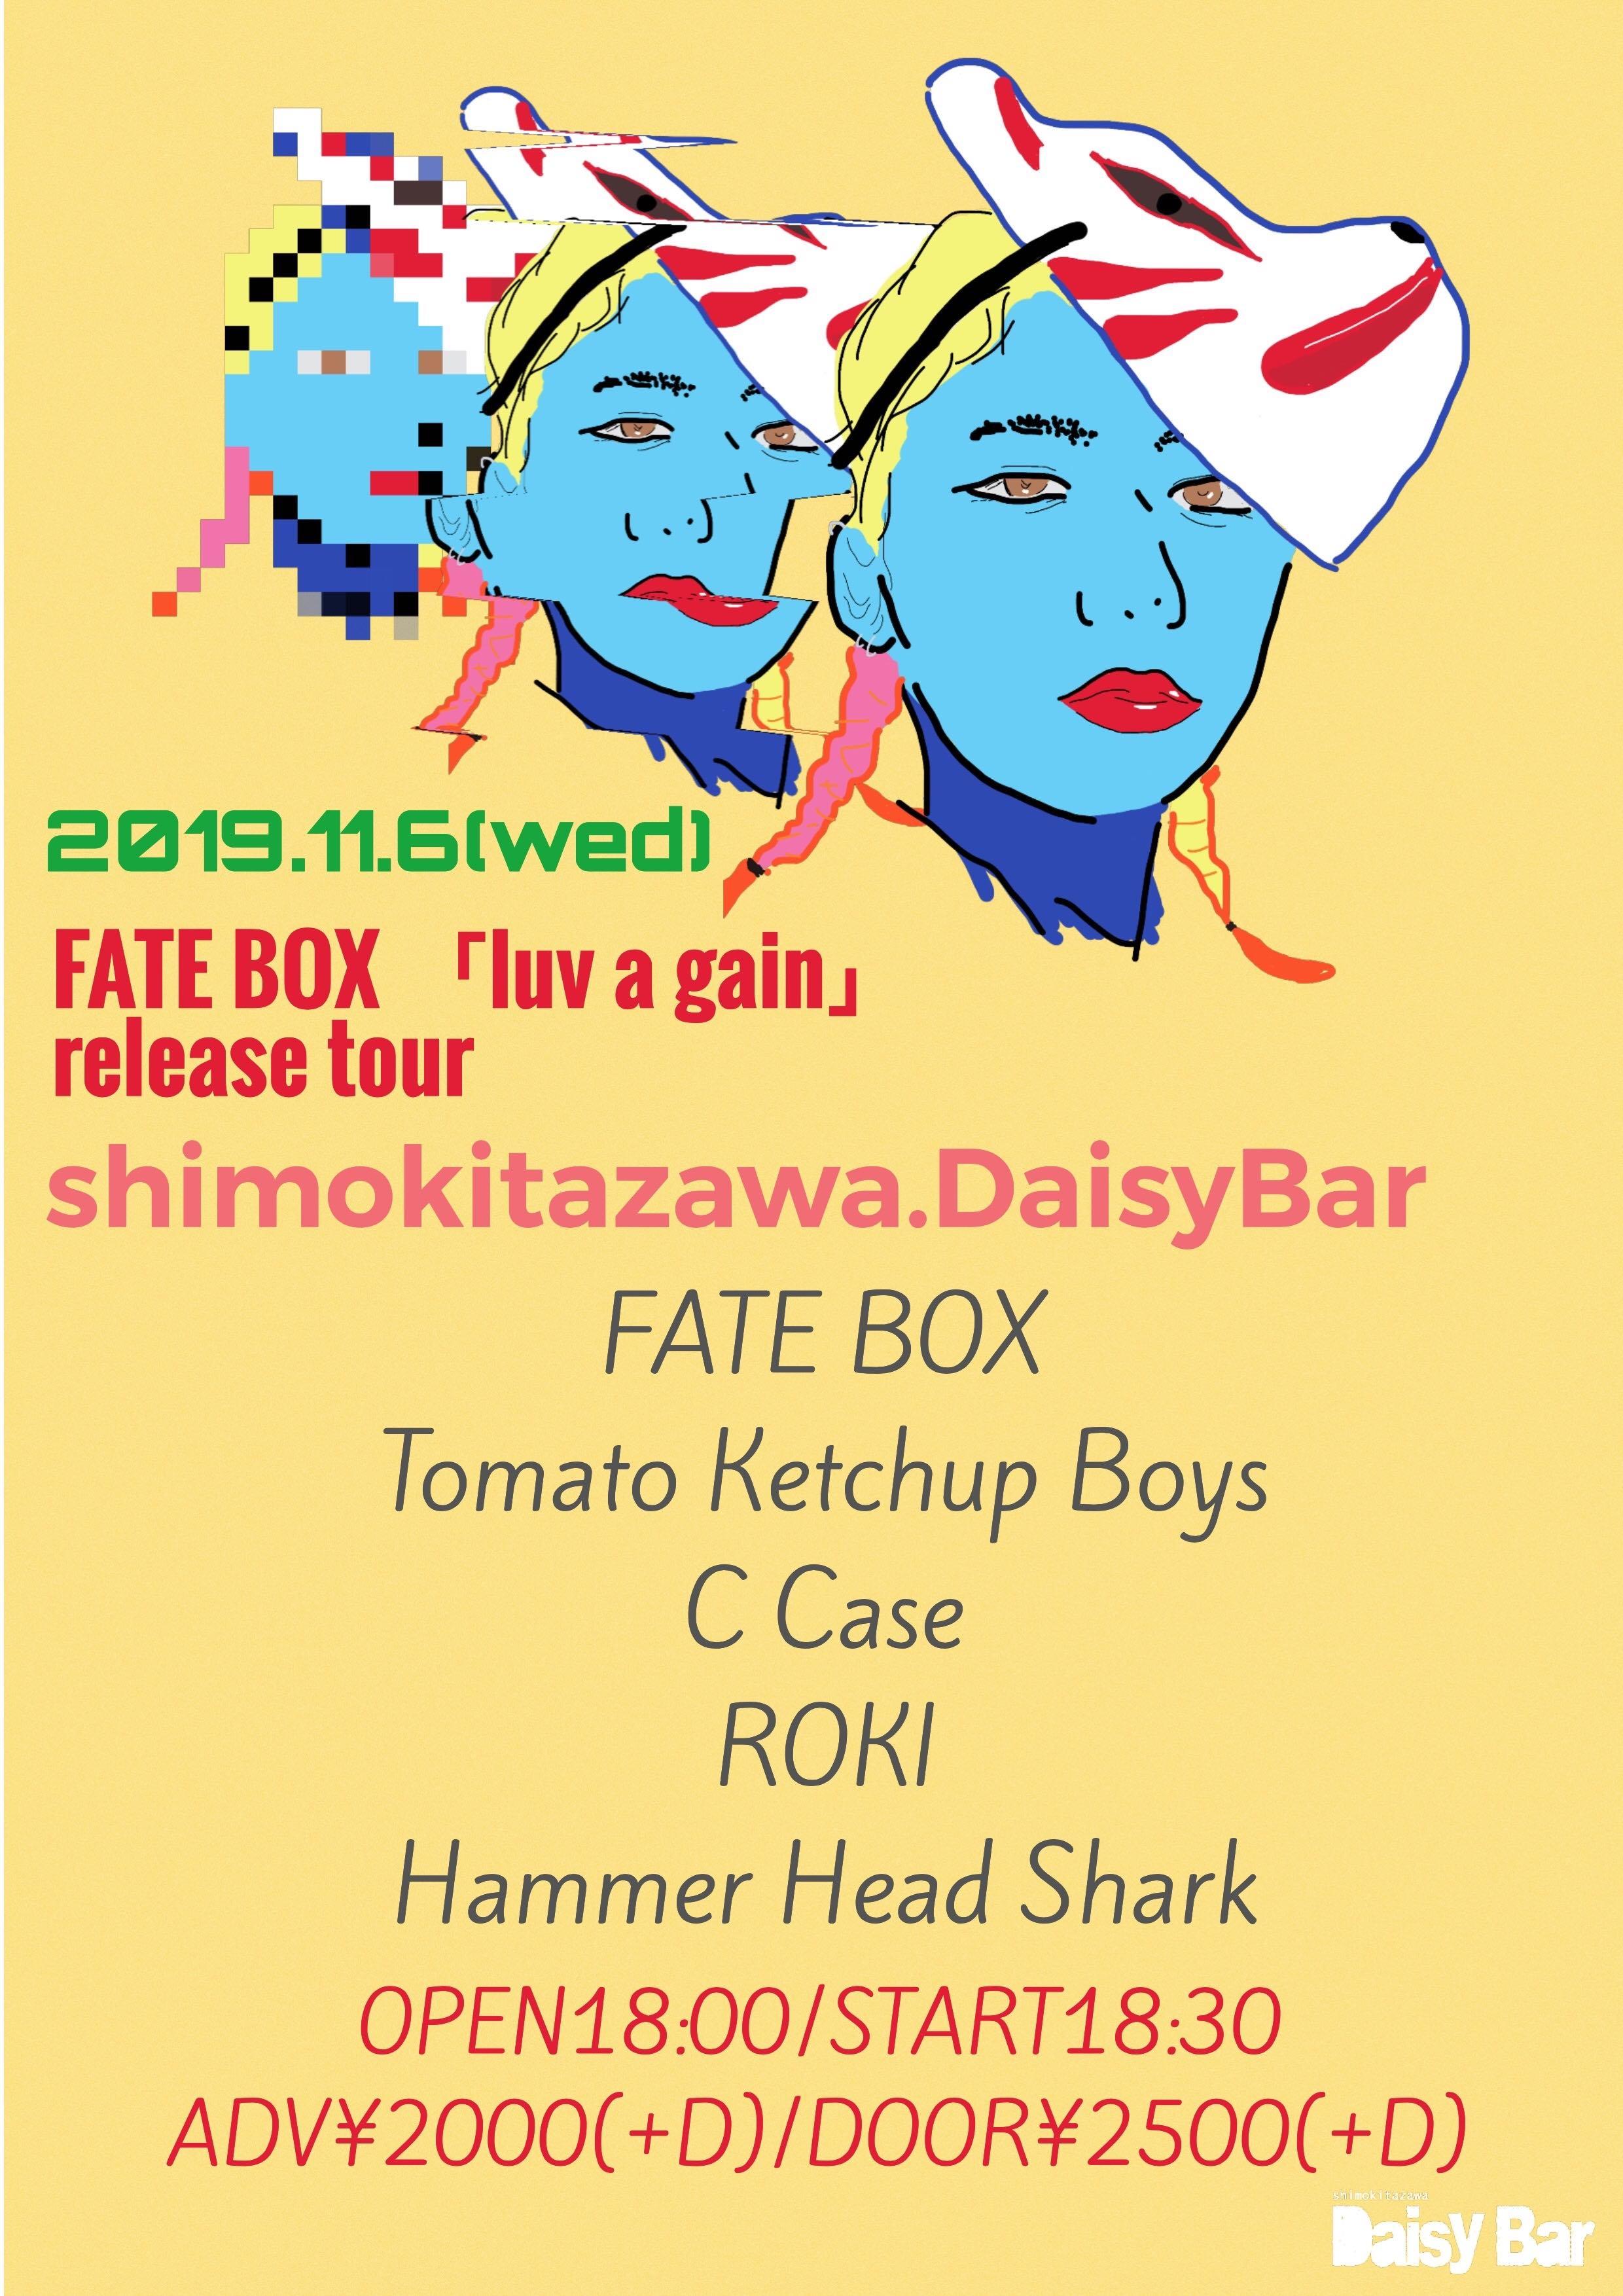 FATE BOX-「luv a gain」release tour-@下北沢DaisyBar編